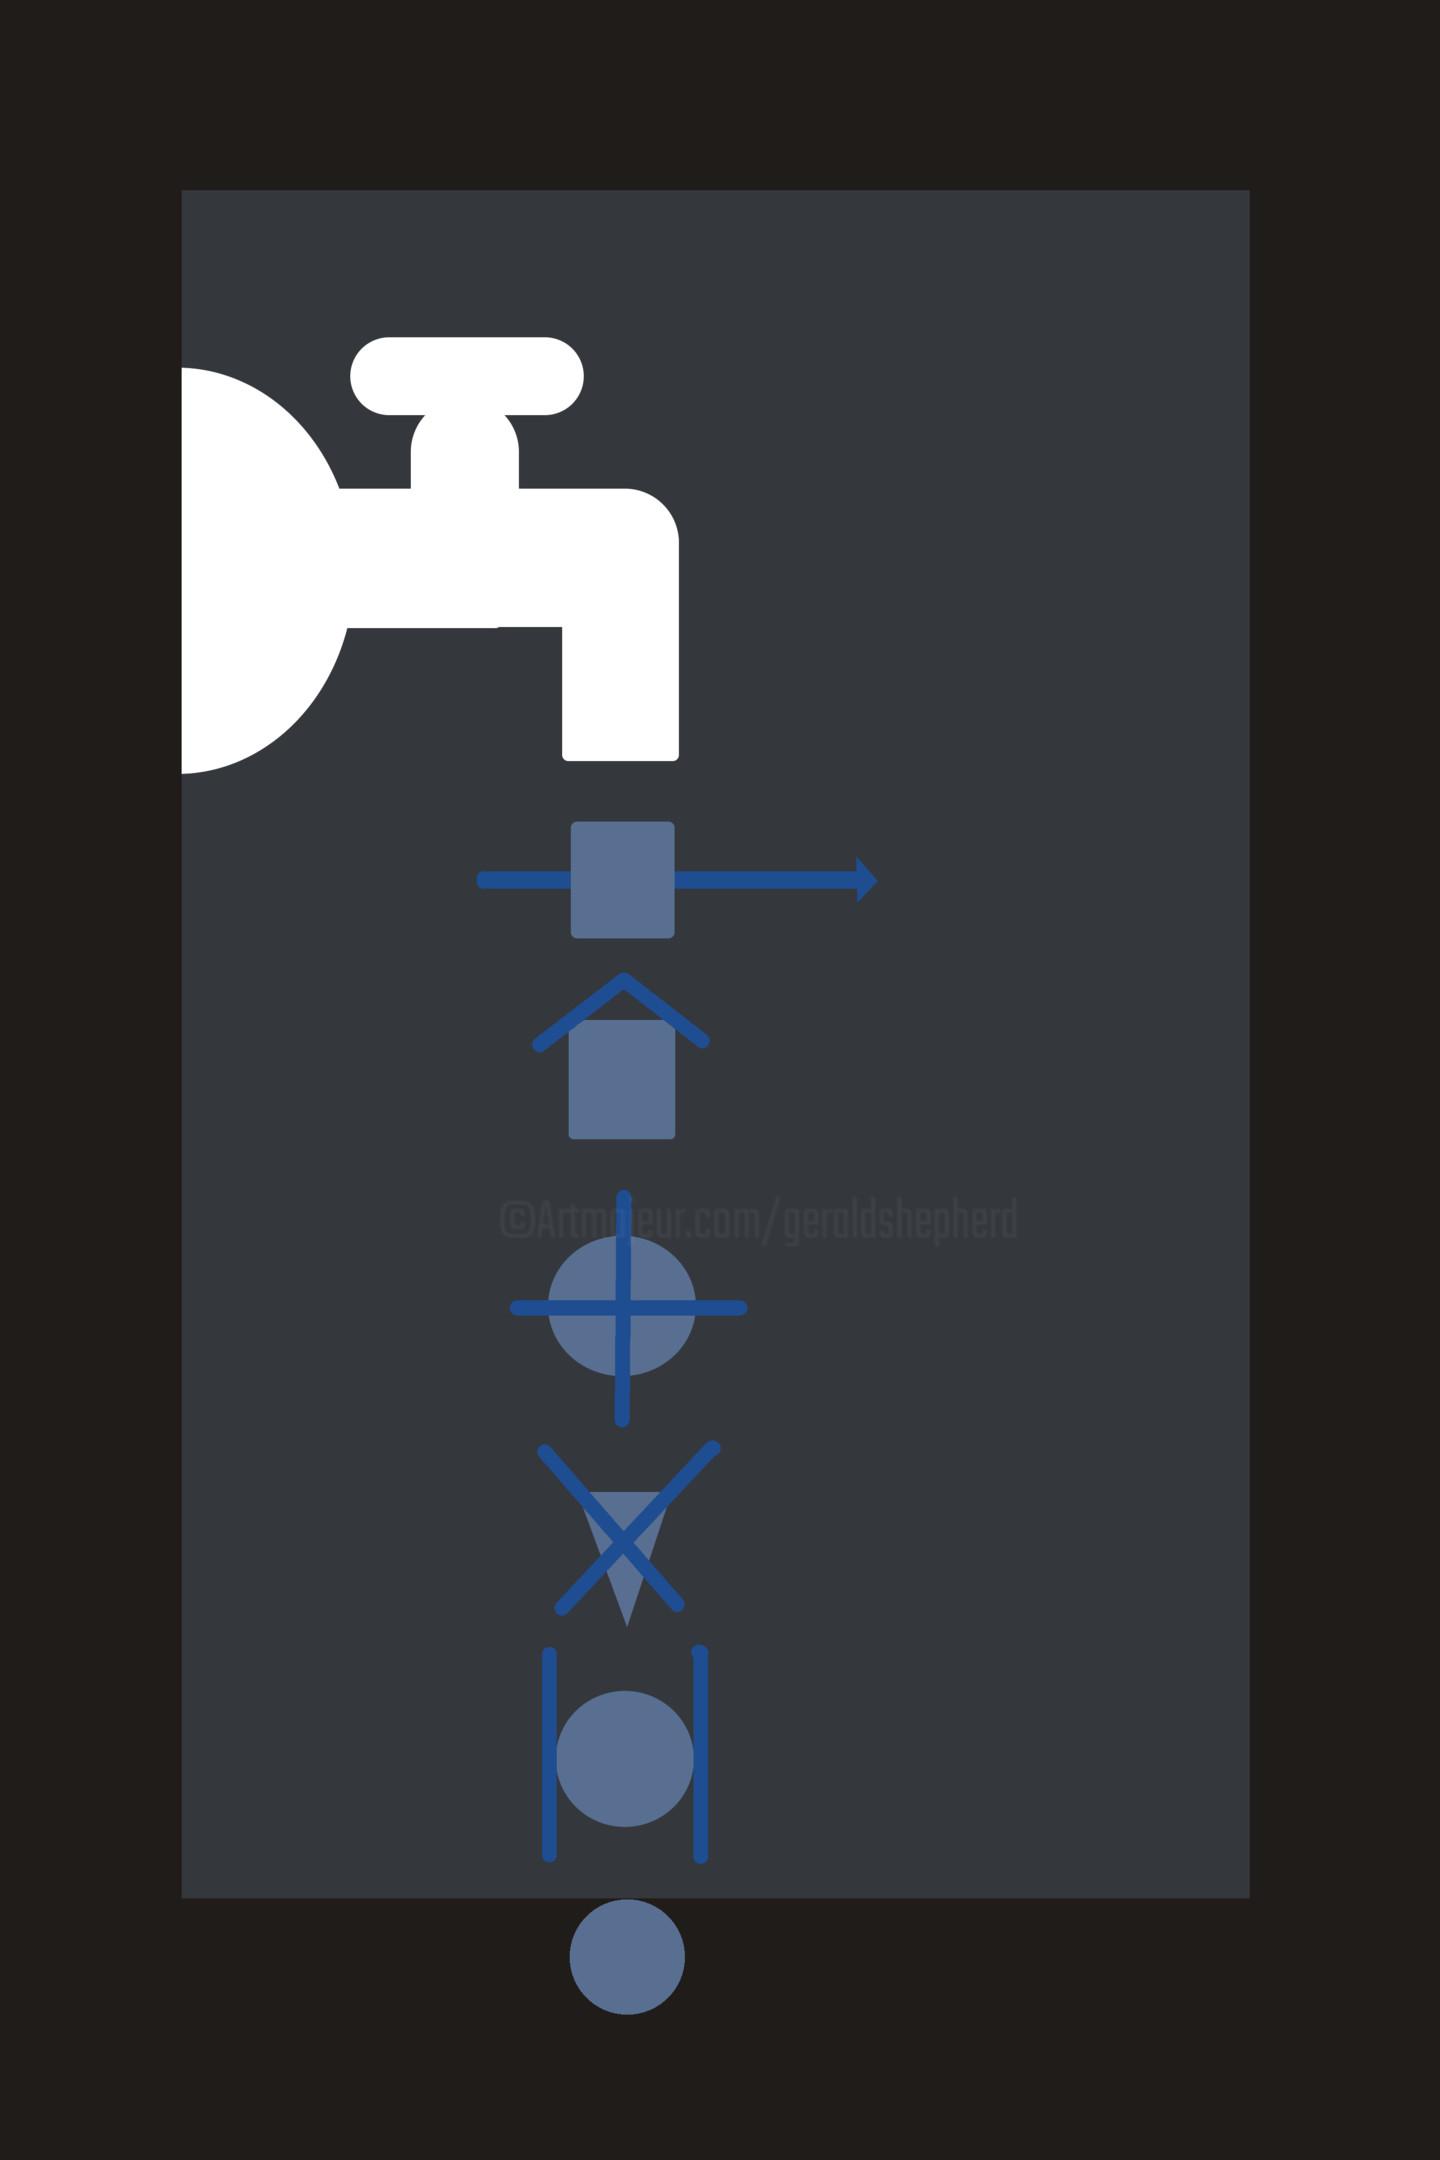 Gerald Shepherd - Dripping Tap